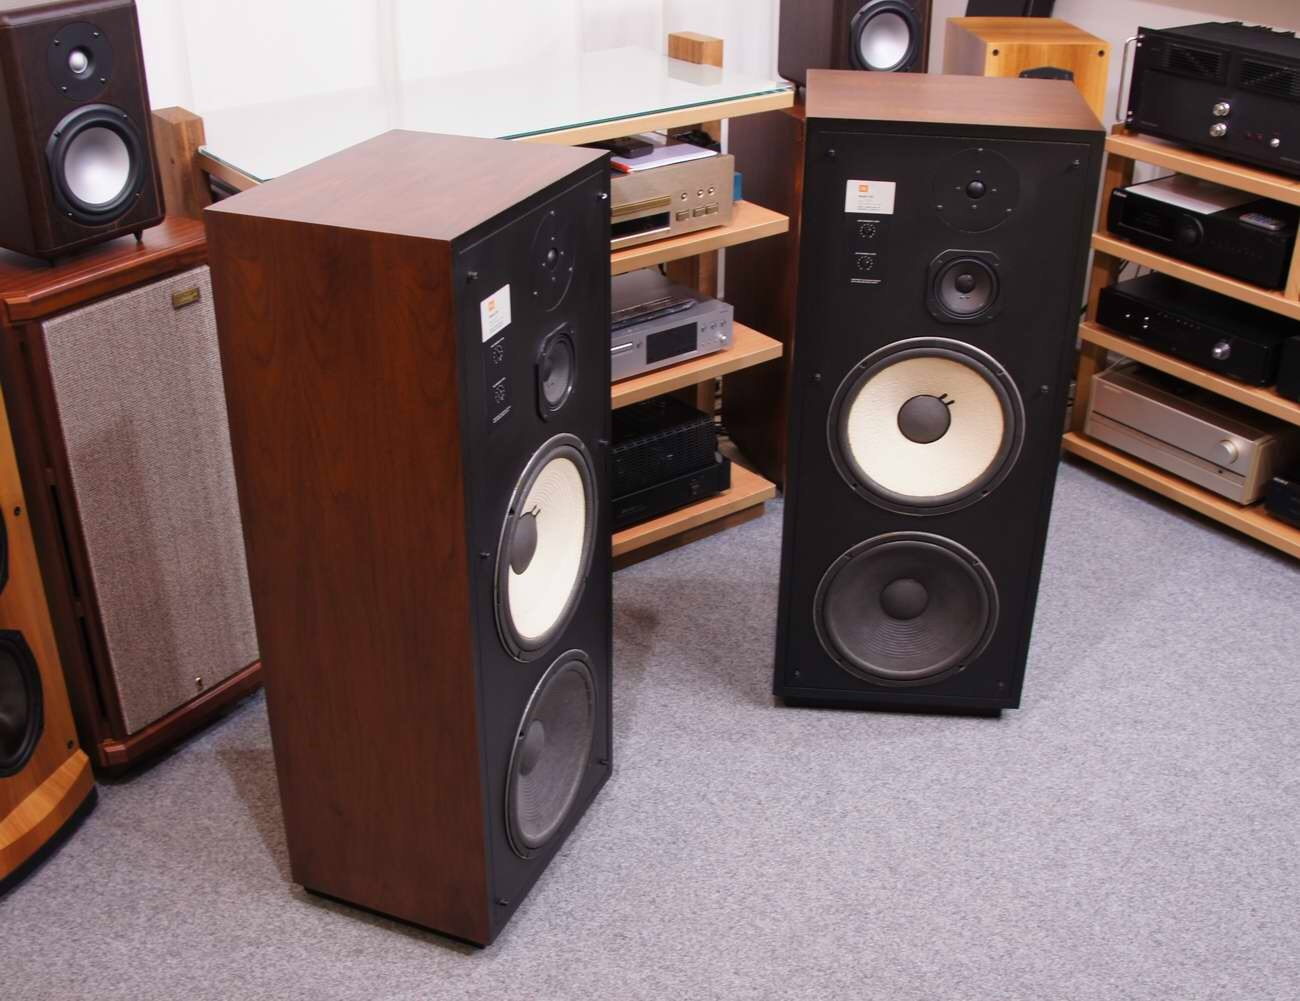 What is the best vintage speaker? - Quora